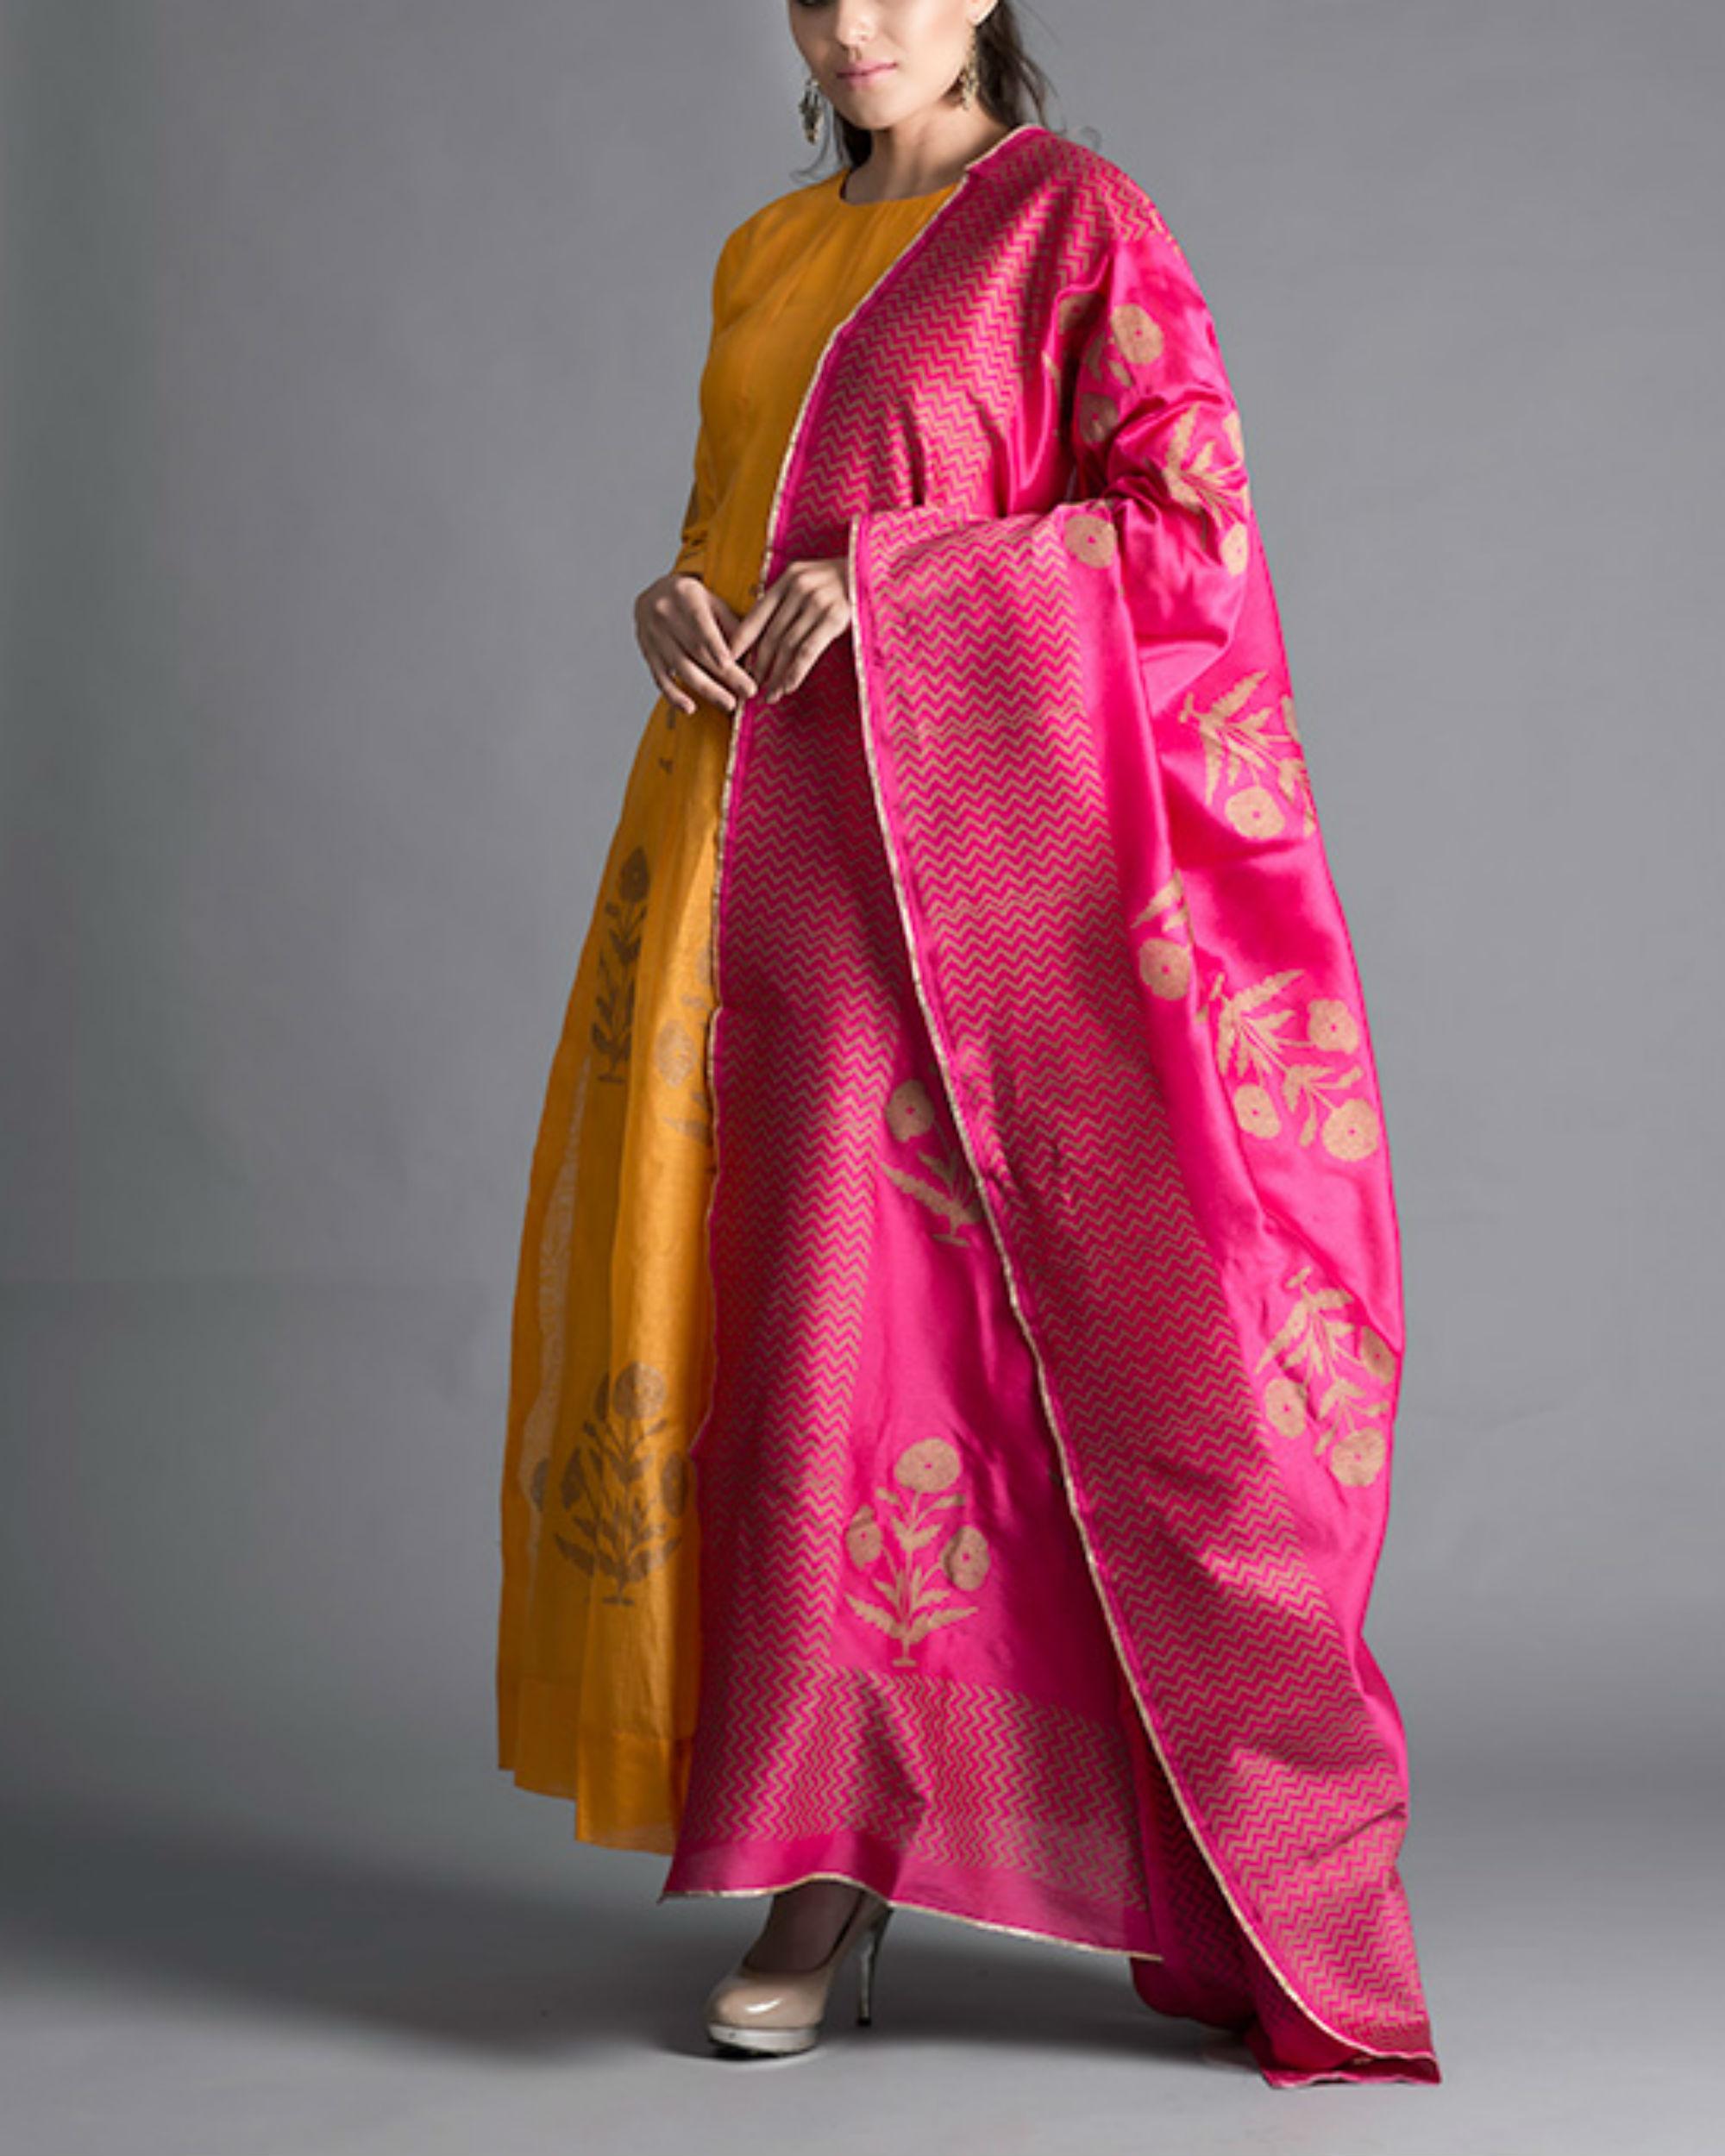 Marigold daisy kalidar kurta set with rani pink dupatta